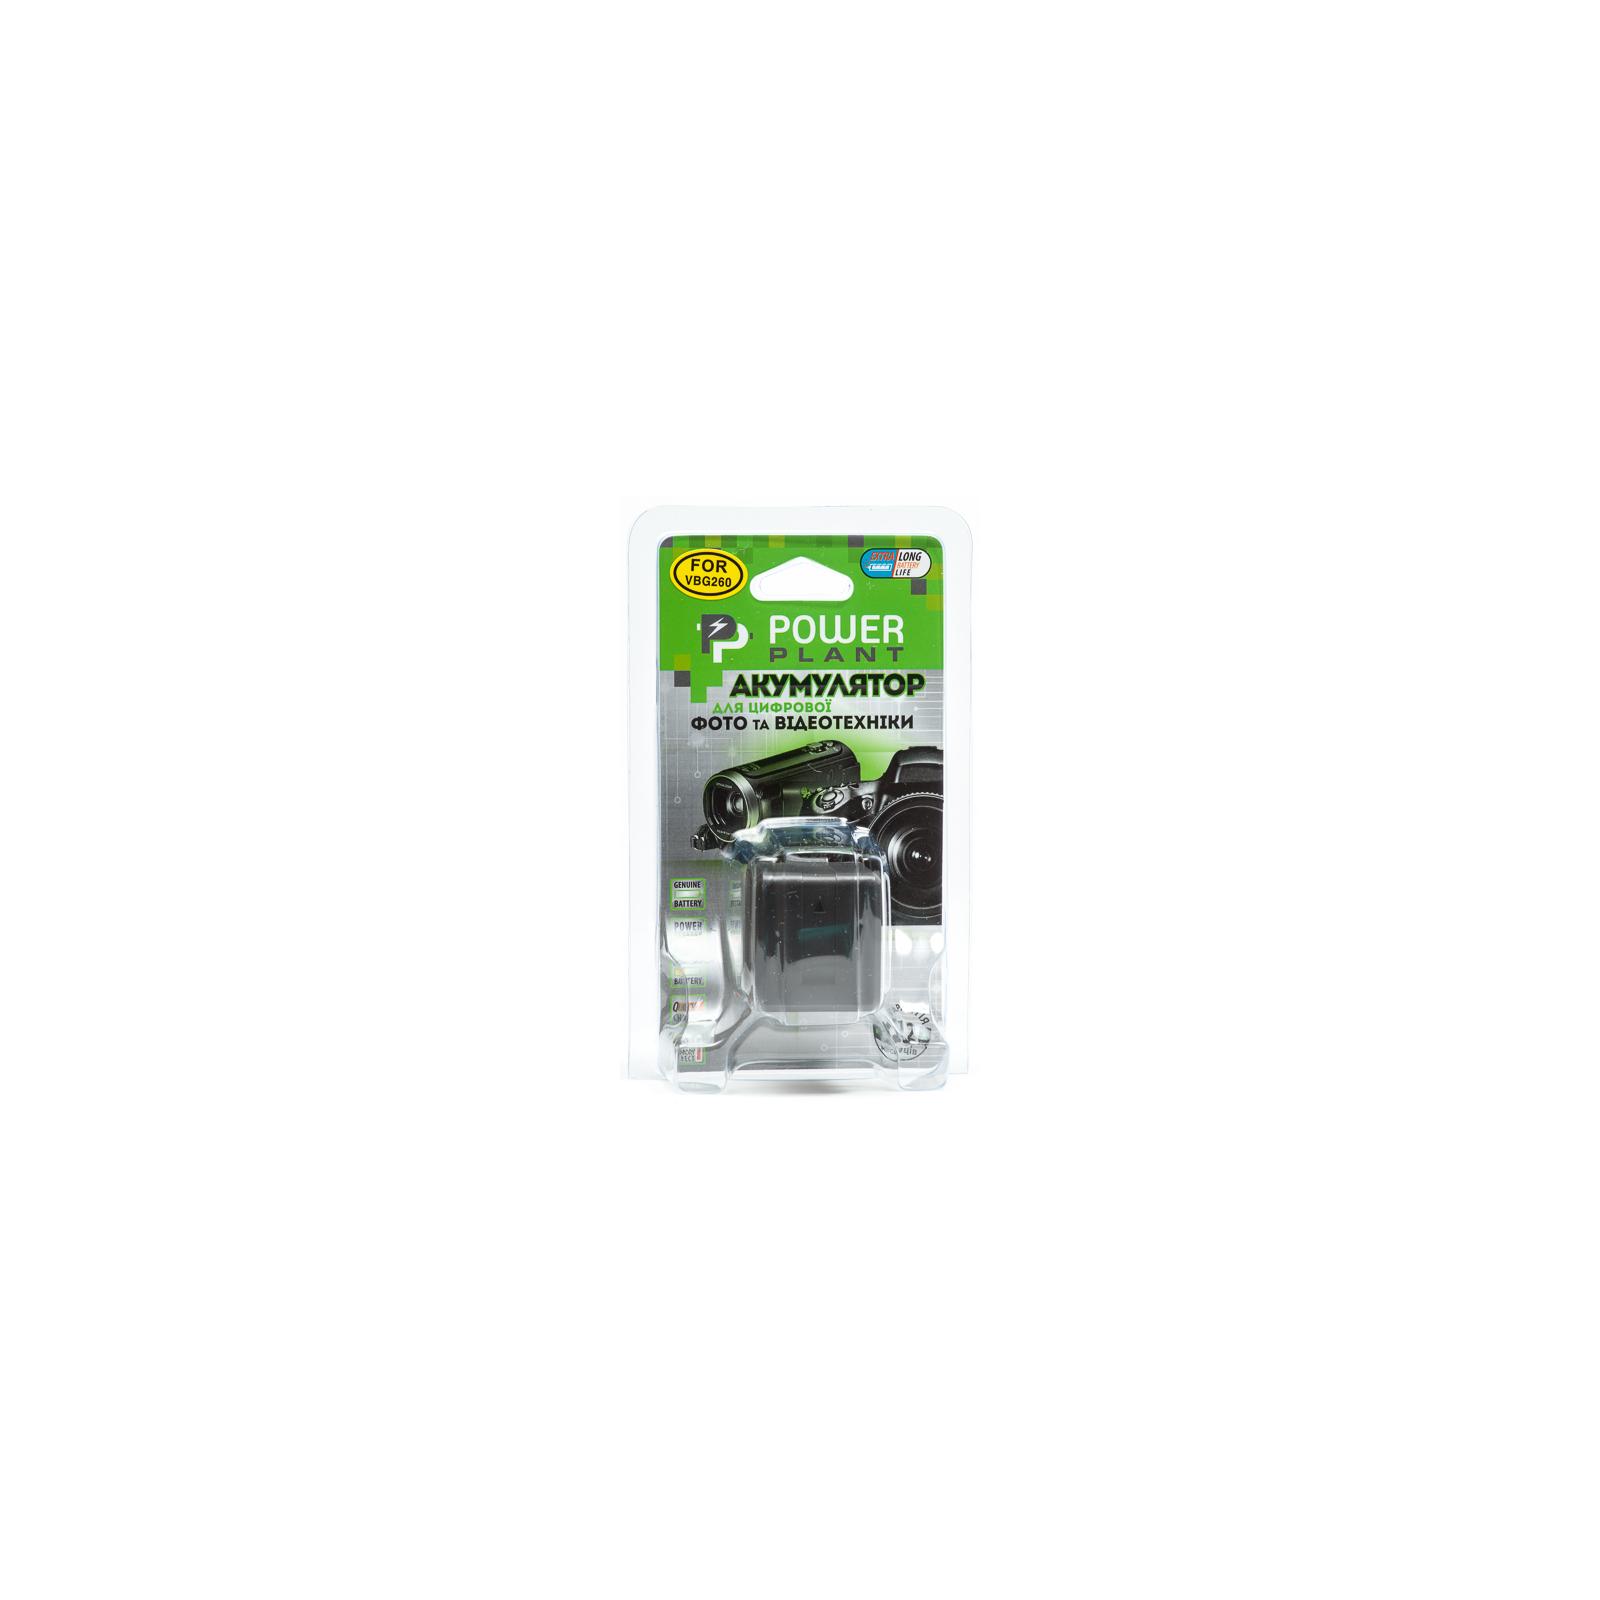 Аккумулятор к фото/видео PowerPlant Panasonic VW-VBG260 Chip (DV00DV1276) изображение 3